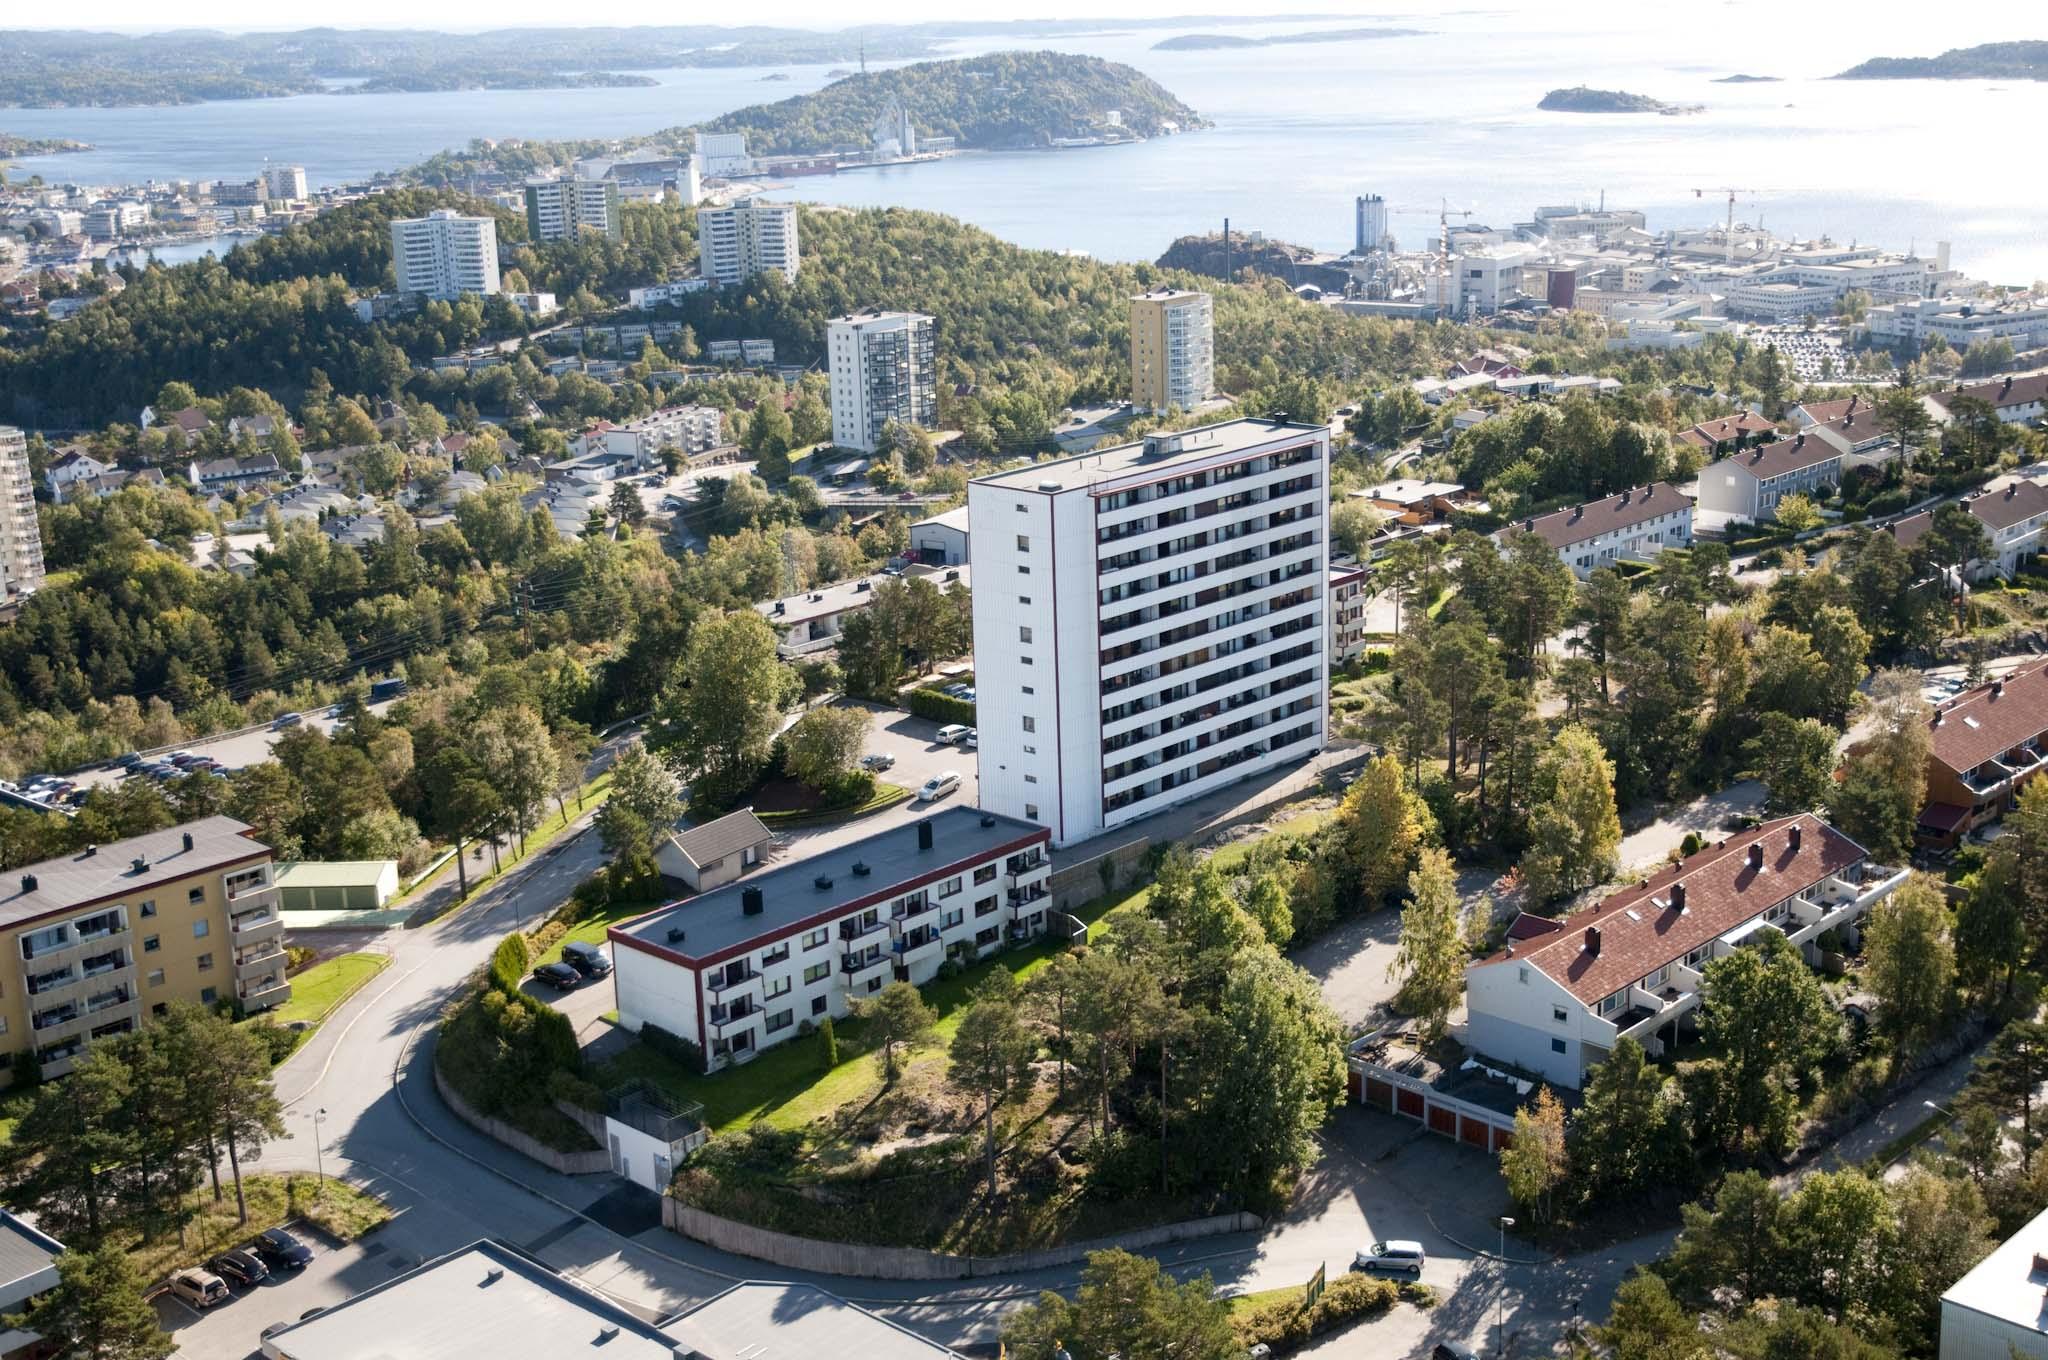 City of Kristiansand